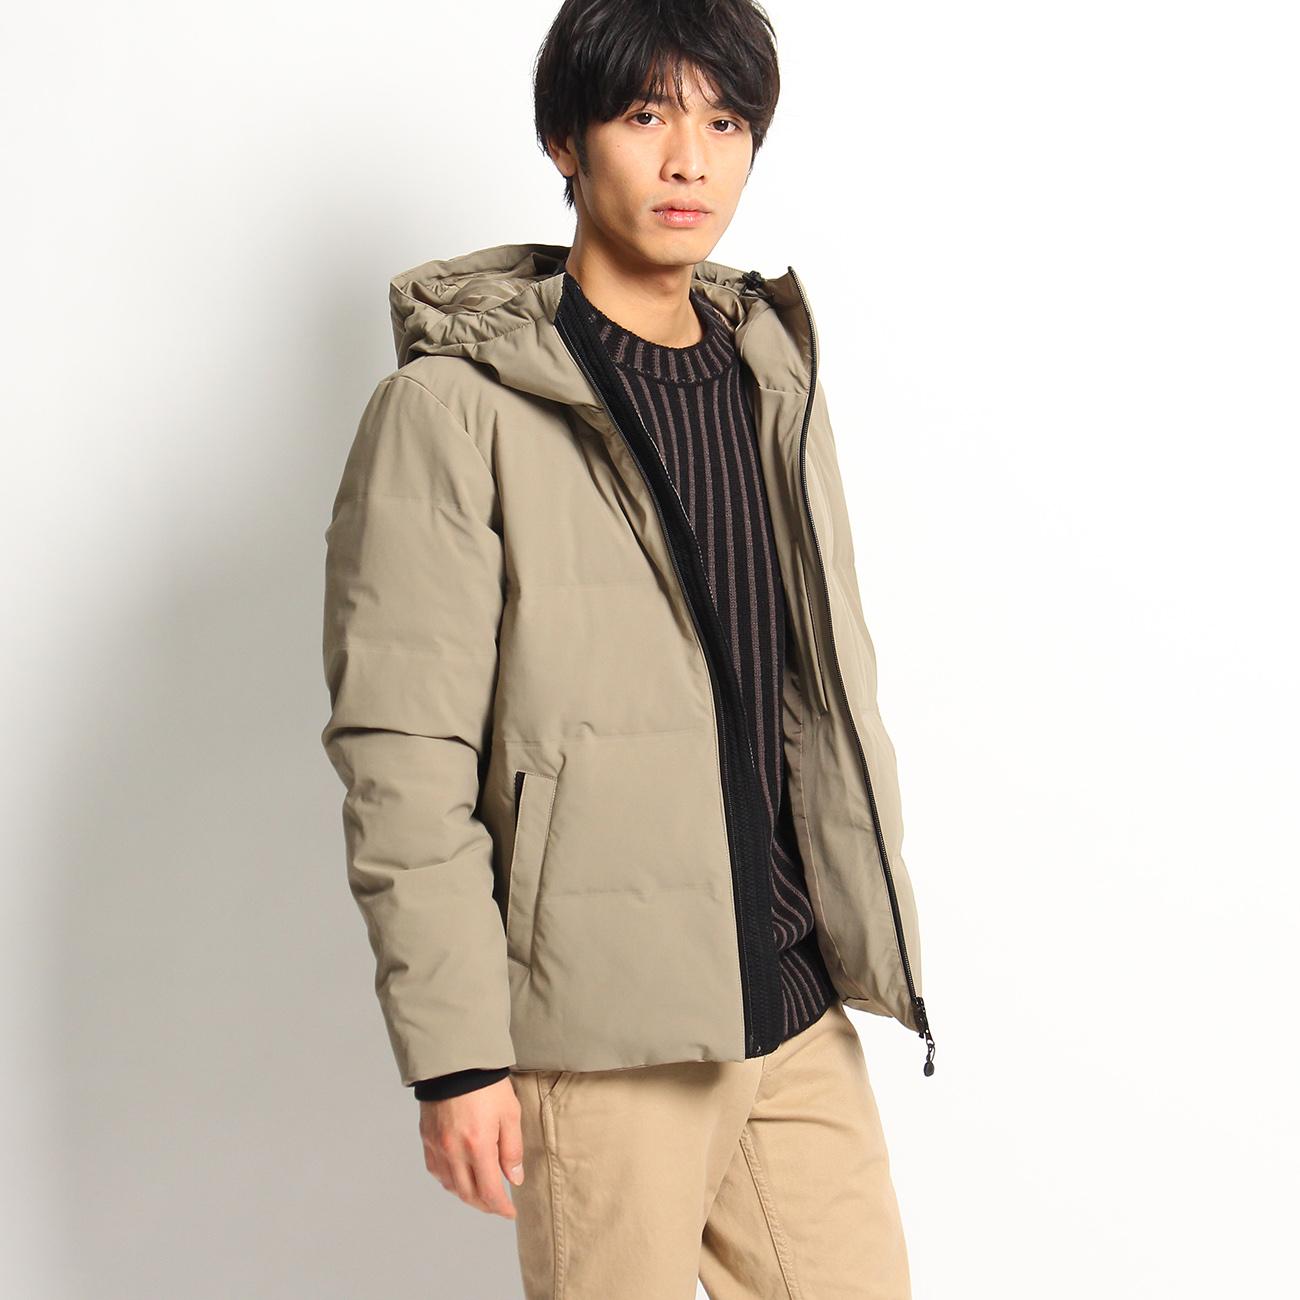 THE SHOP TK(Men) (ザ ショップ ティーケー(メンズ)) 【撥水・防風】シームレスダウンジャケット